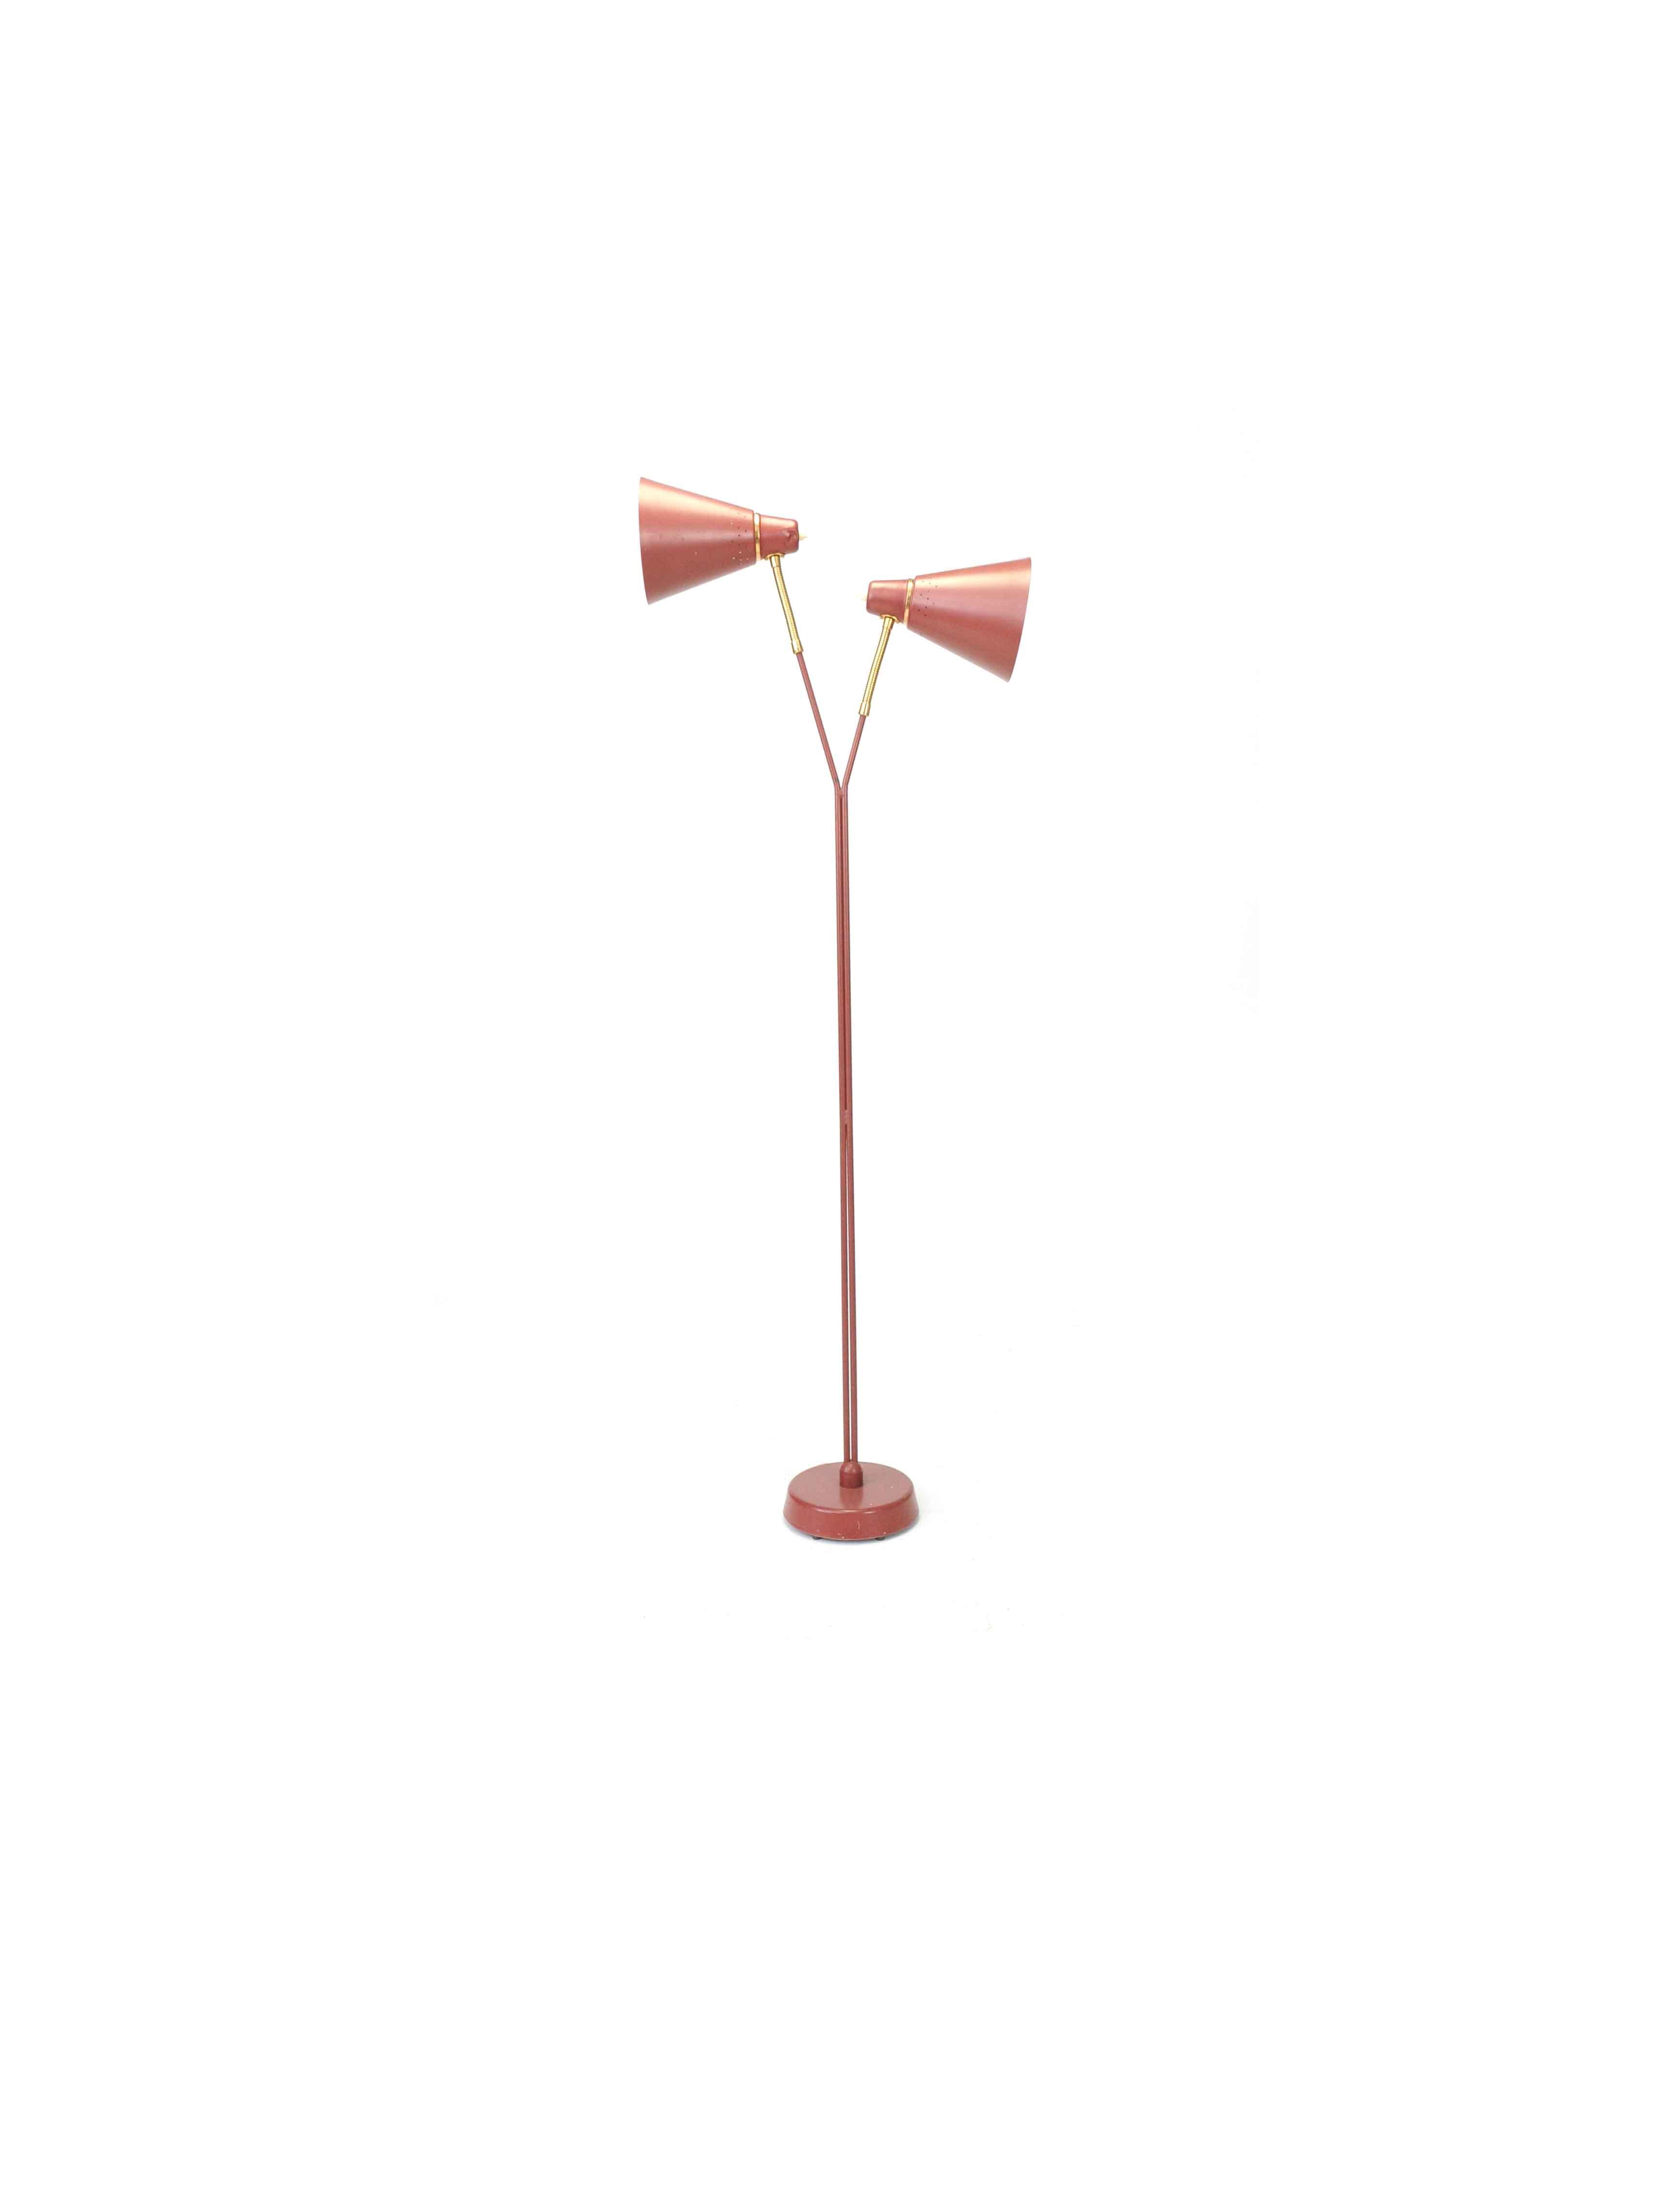 TWO HEADED GOOS NECK FLOOR LAMP